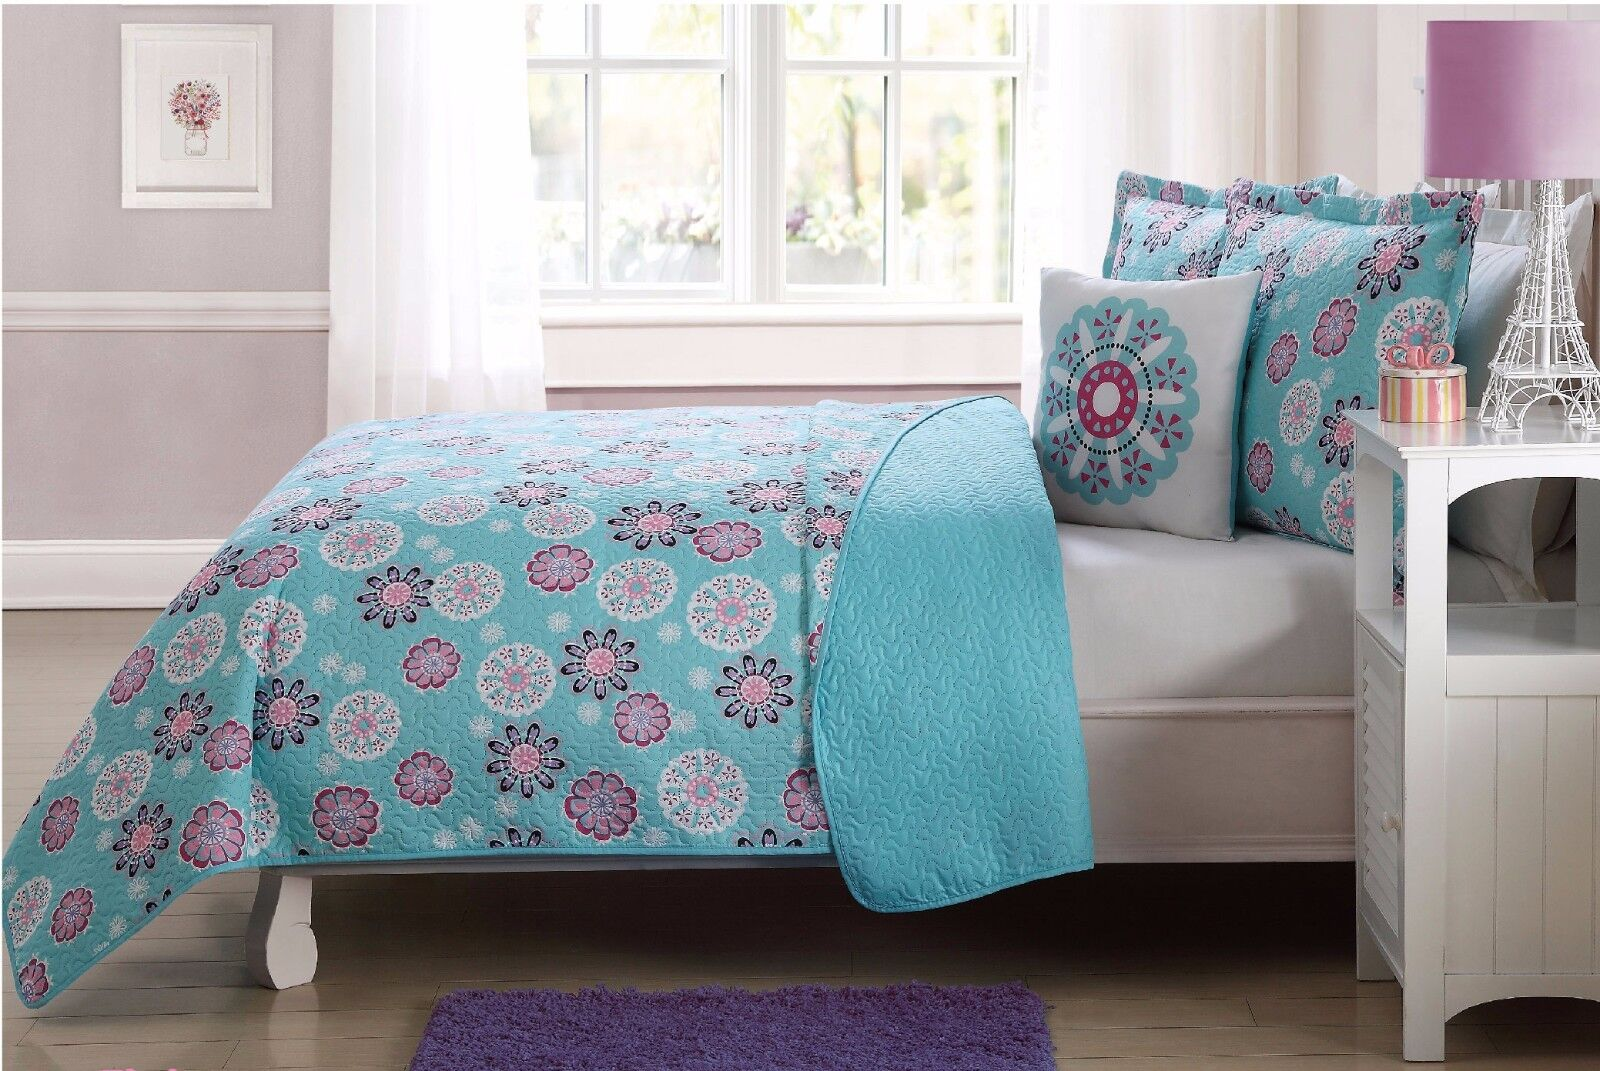 Fancy Linen 3pc Twin Size Reversible Bedspread Flakes Turquo